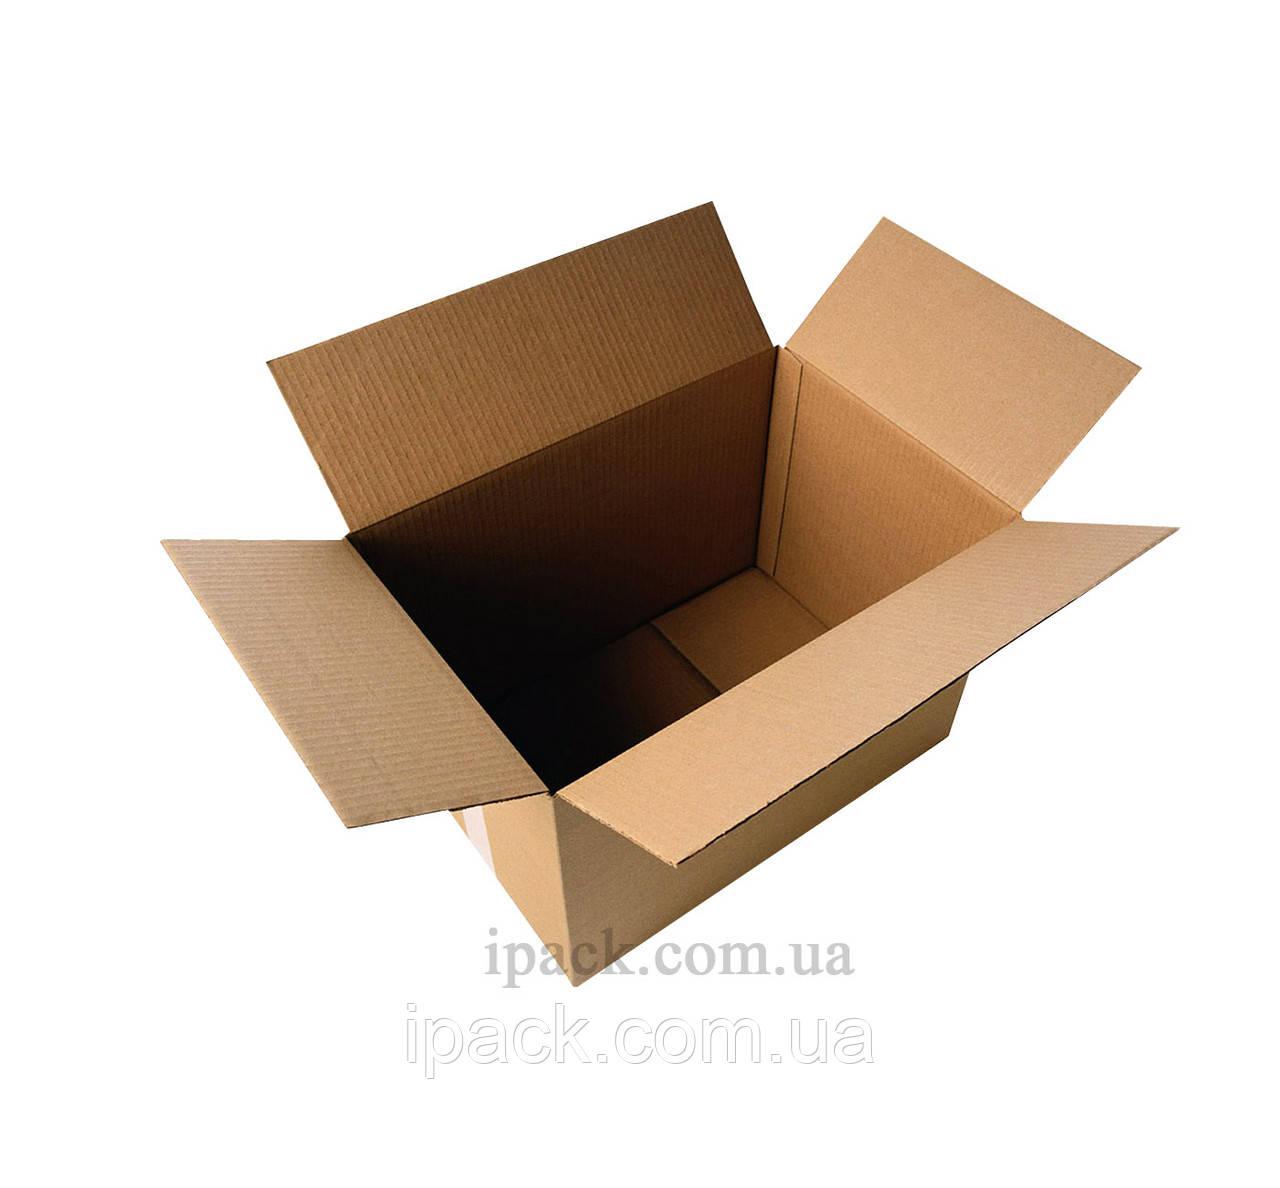 Гофроящик 240*170*50 мм, бурый, четырехклапанный картонный короб